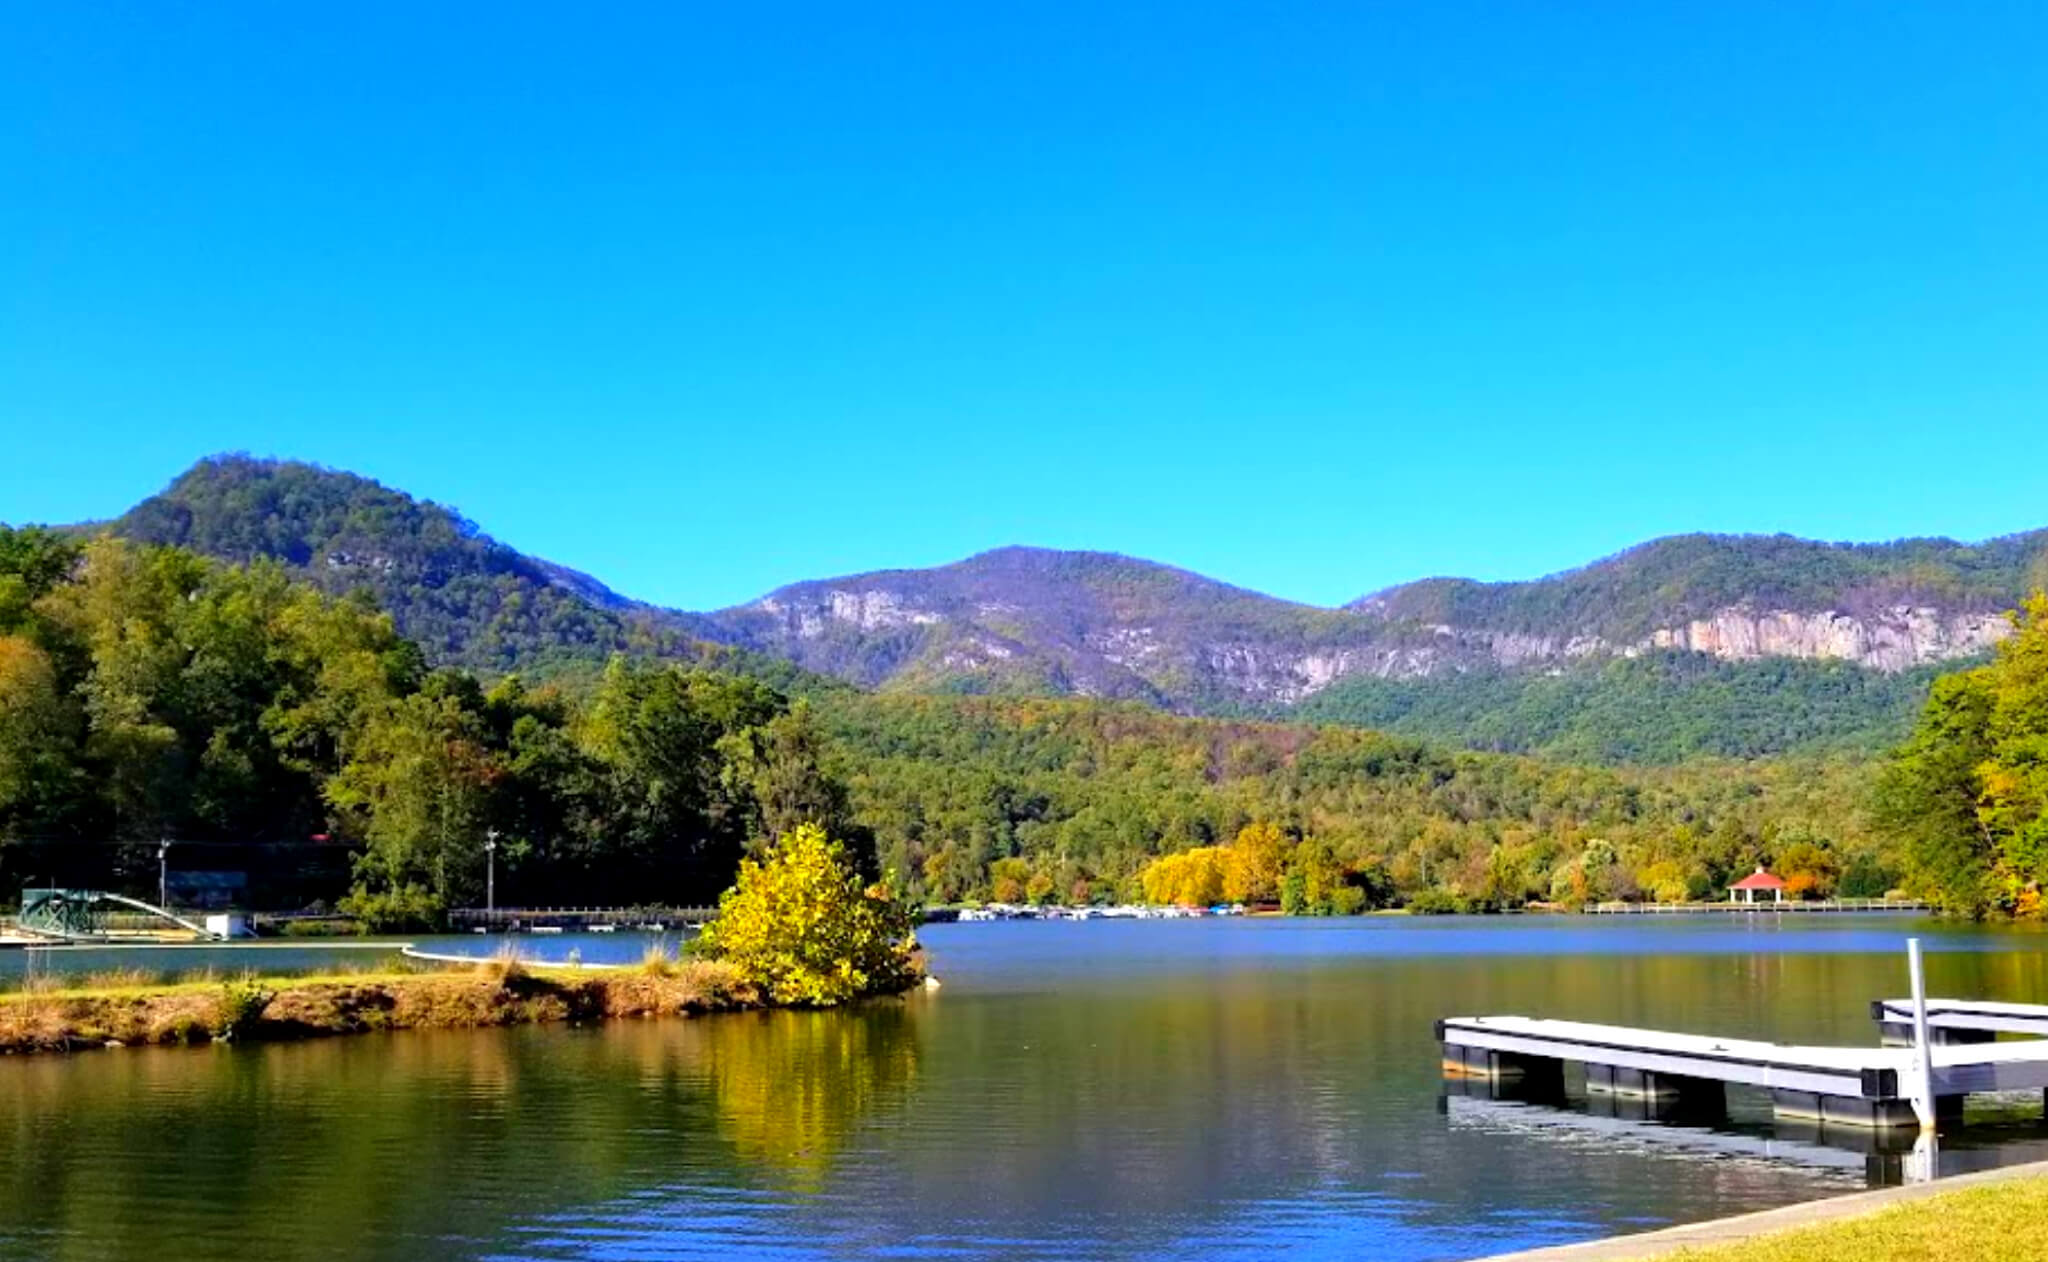 Lure-Lake-Fishing-Report-Guide-North-Carolina-NC-01-3